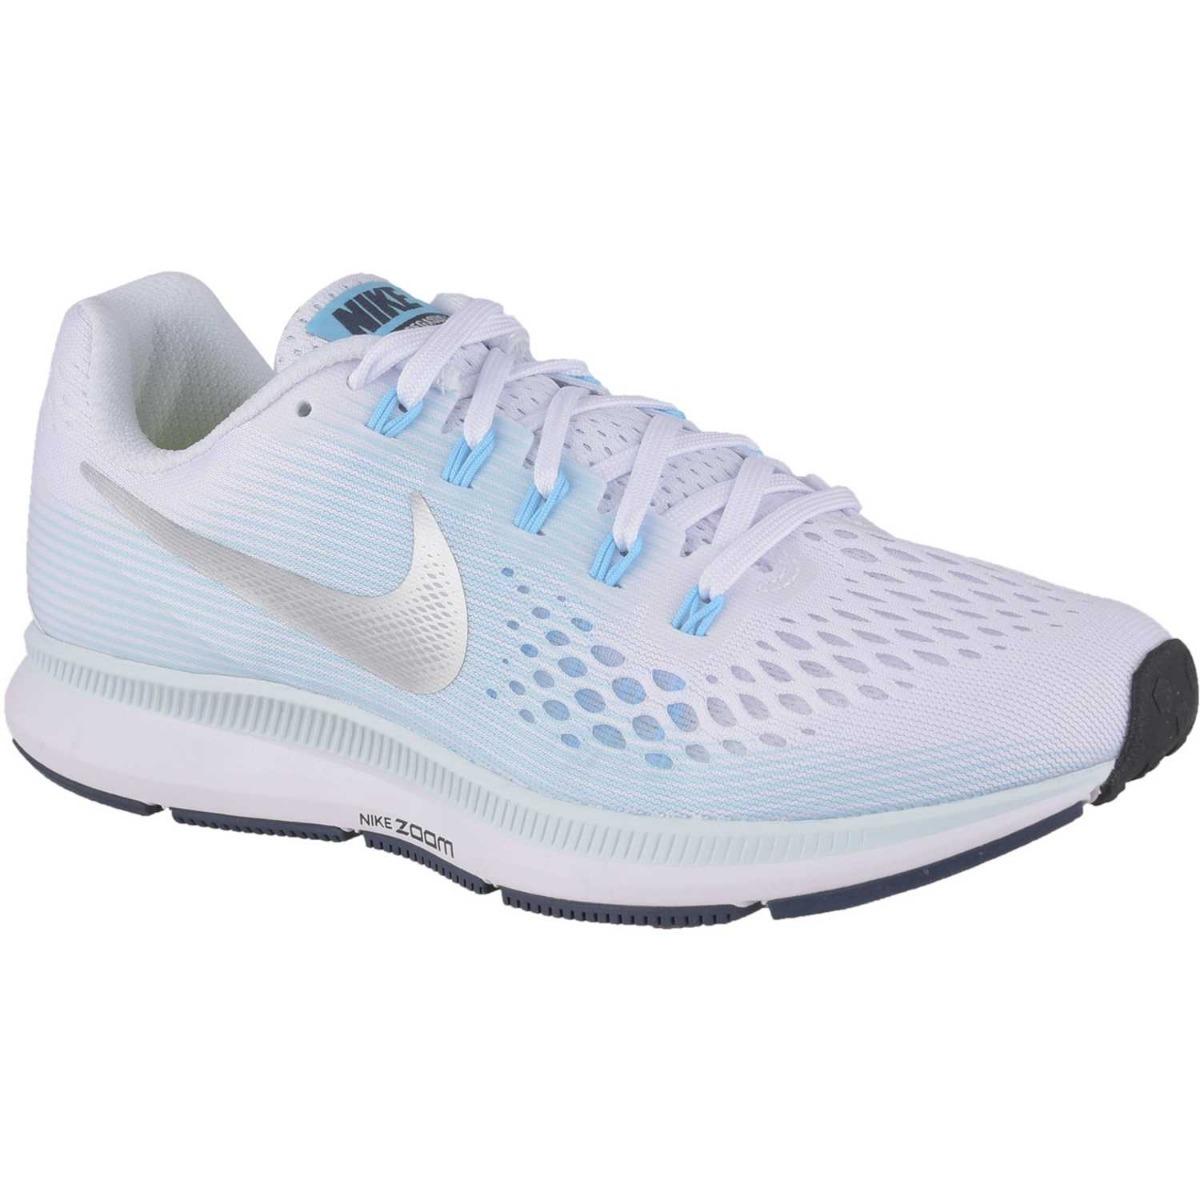 nike mujer zapatillas 2019 running